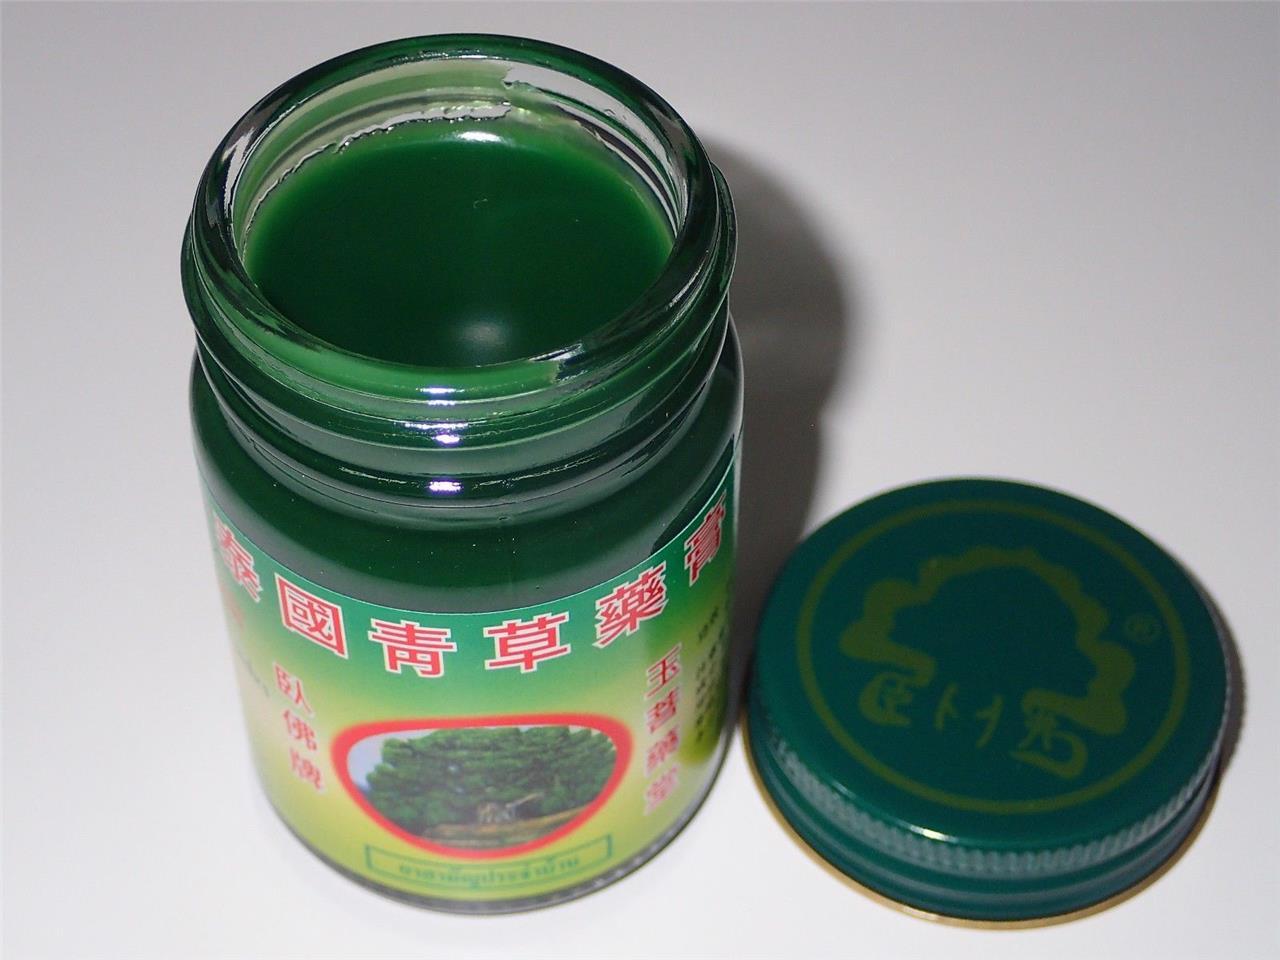 15-Or-50-Grams-Of-Original-Thai-Balm-100-Natural-Thai-Herbal-Green-Massage-Balm